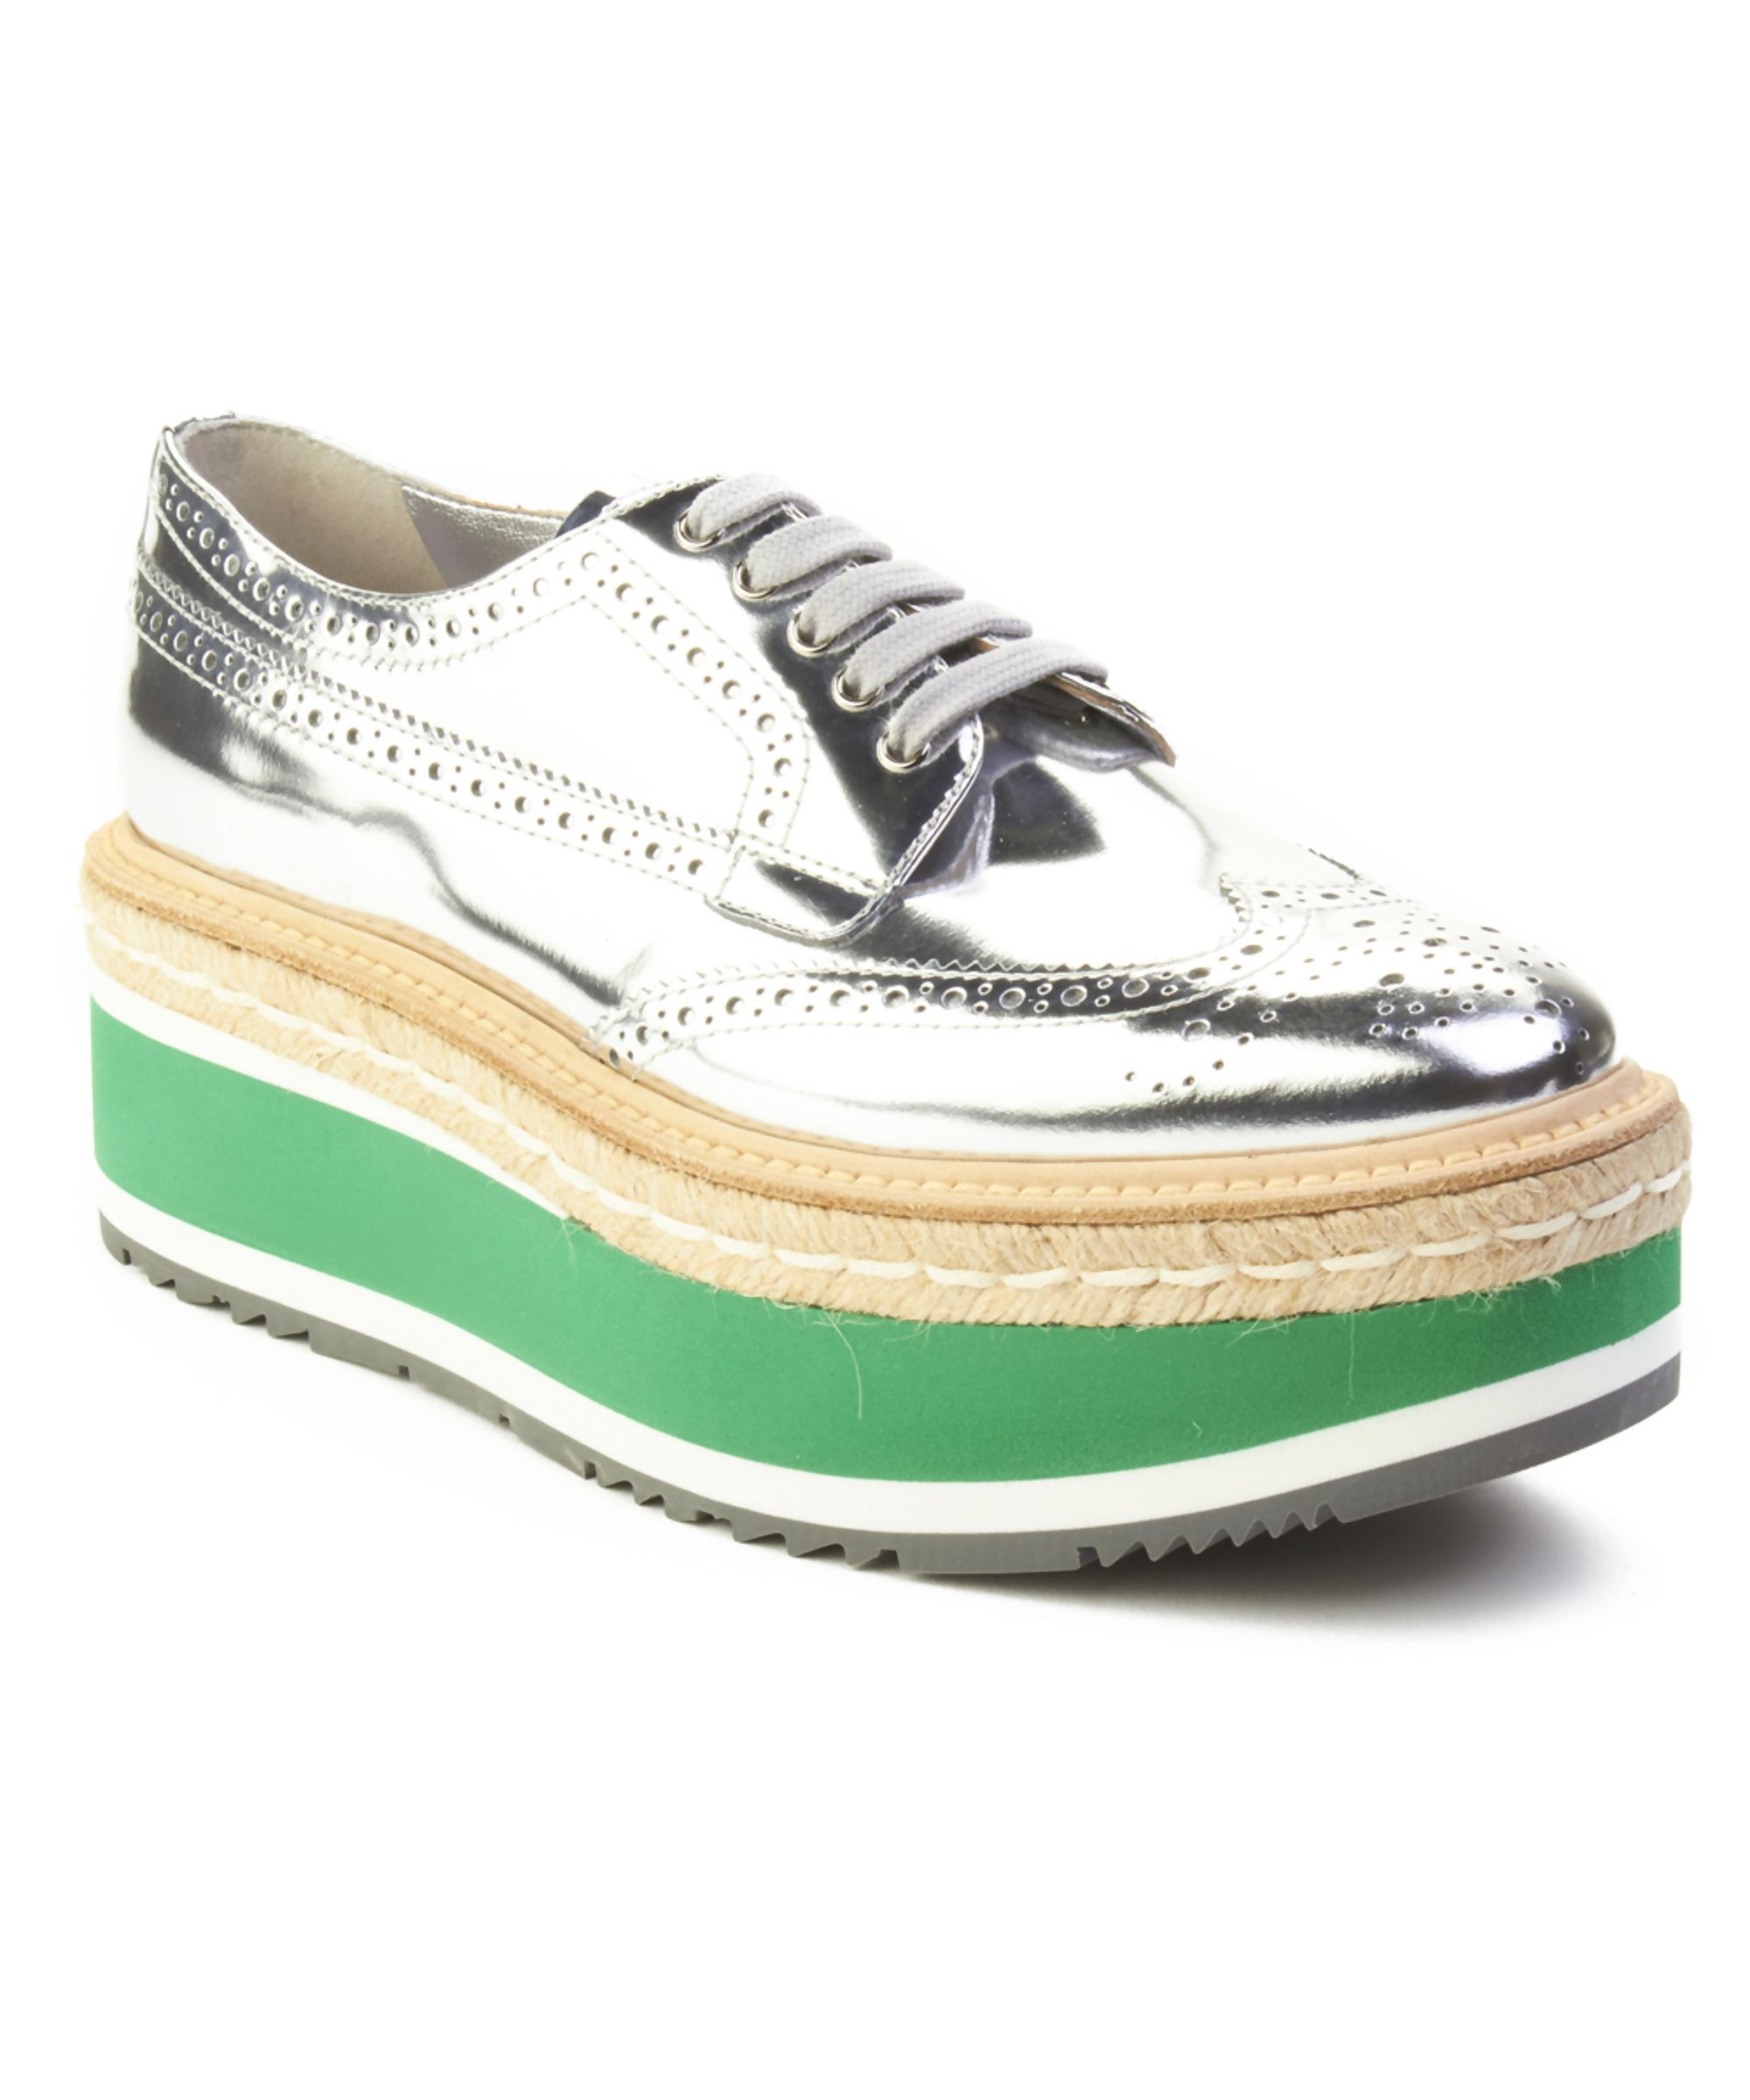 PRADA | Prada Women's Leather Platform Derby Shoes Silver #Shoes #Sneakers  #PRADA